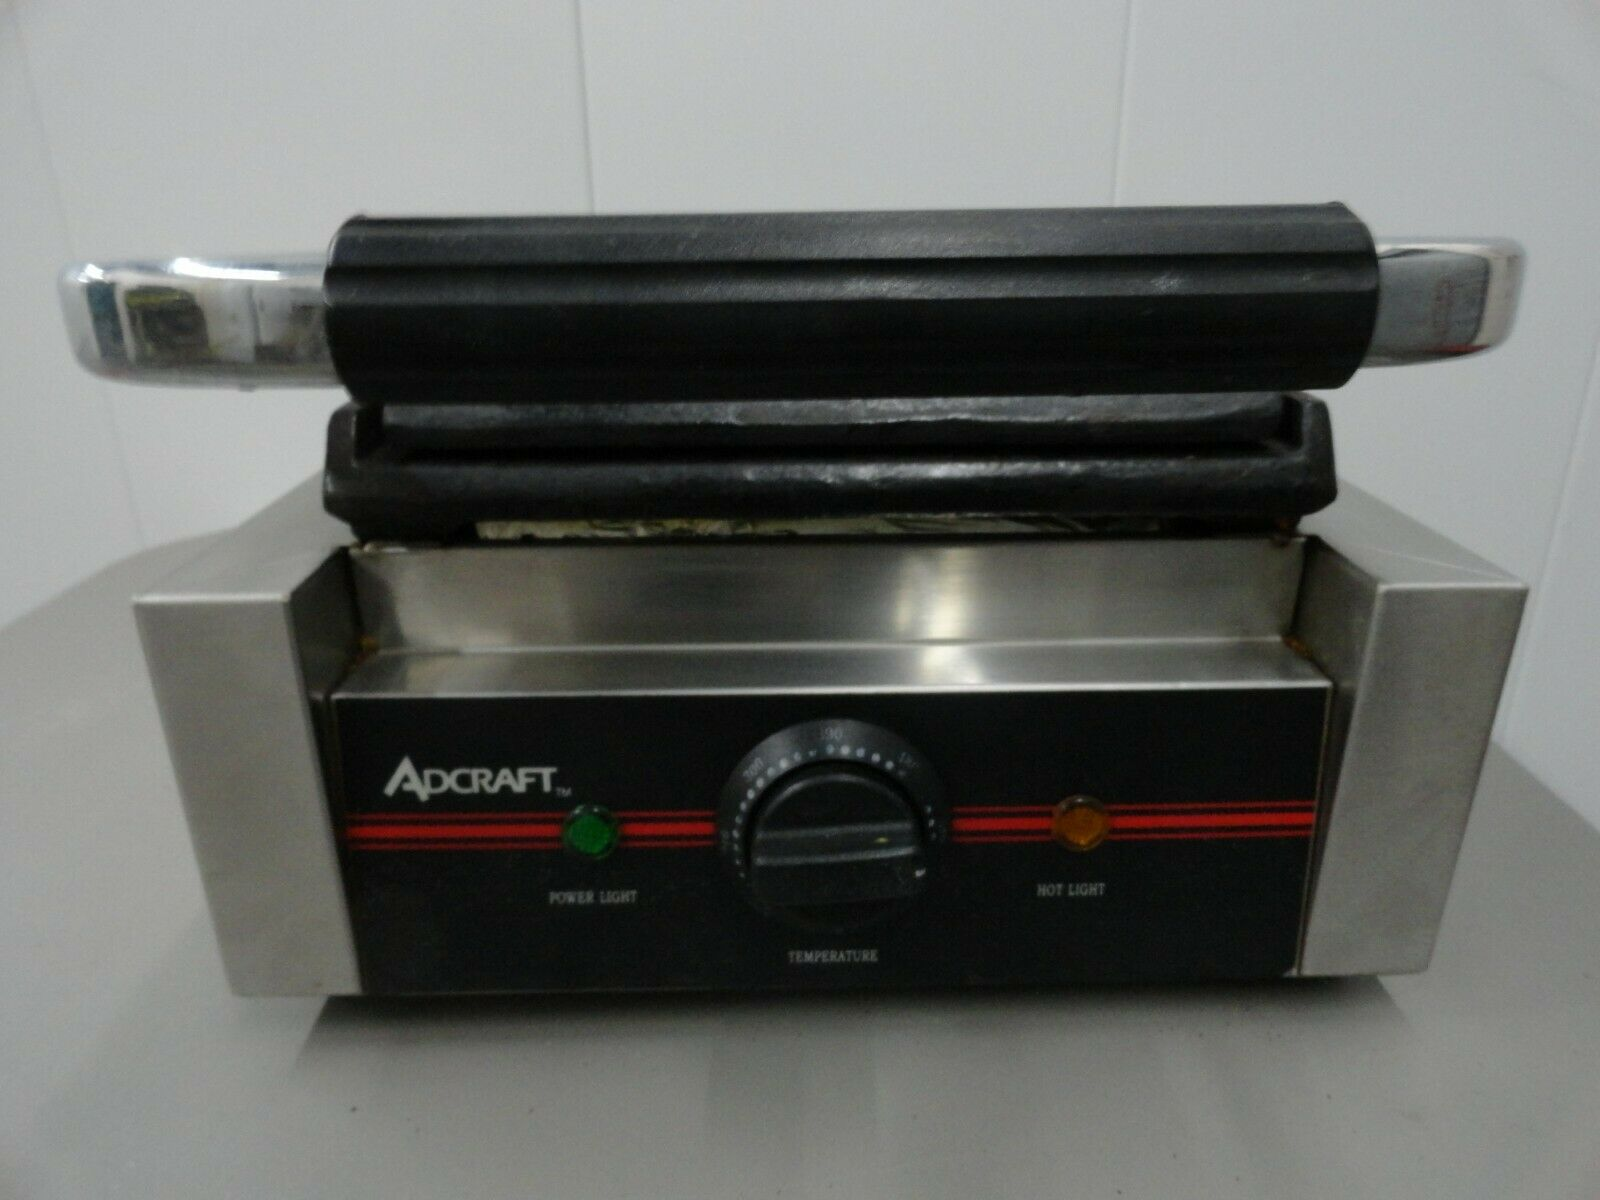 AdCraft Acier Inoxydable Plaque Plane Panini Sandwich Grill SG-811F